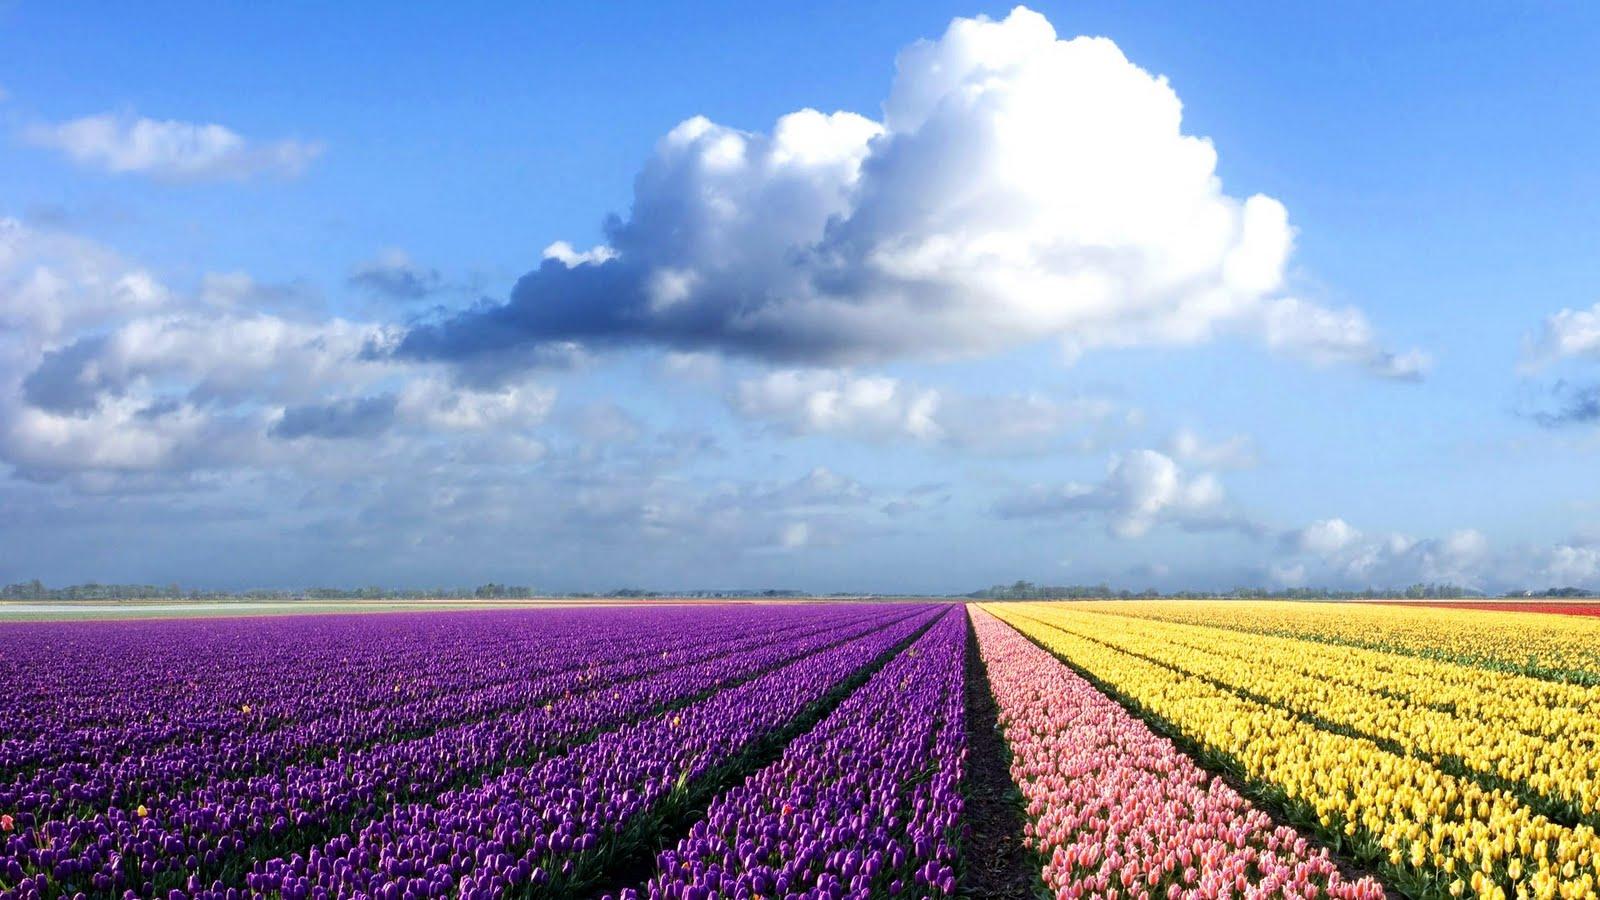 http://4.bp.blogspot.com/-i9-N0Xb0znc/TipsgjTaTKI/AAAAAAAAAHs/QidmQMbNXNg/s1600/%255Bwallcoo_com%255D_colorful+flower+field.jpg